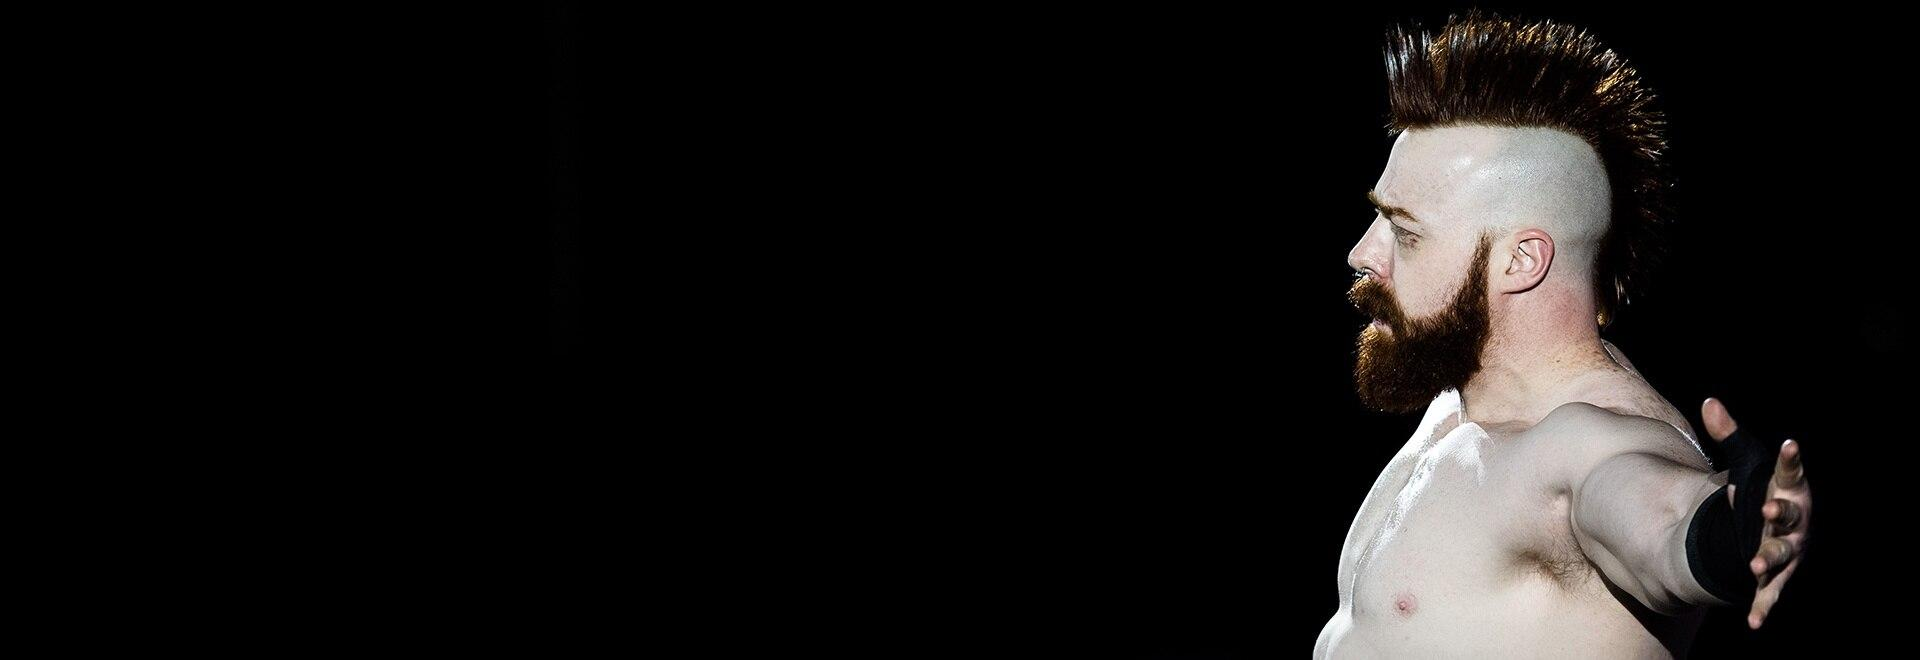 Ep. 37